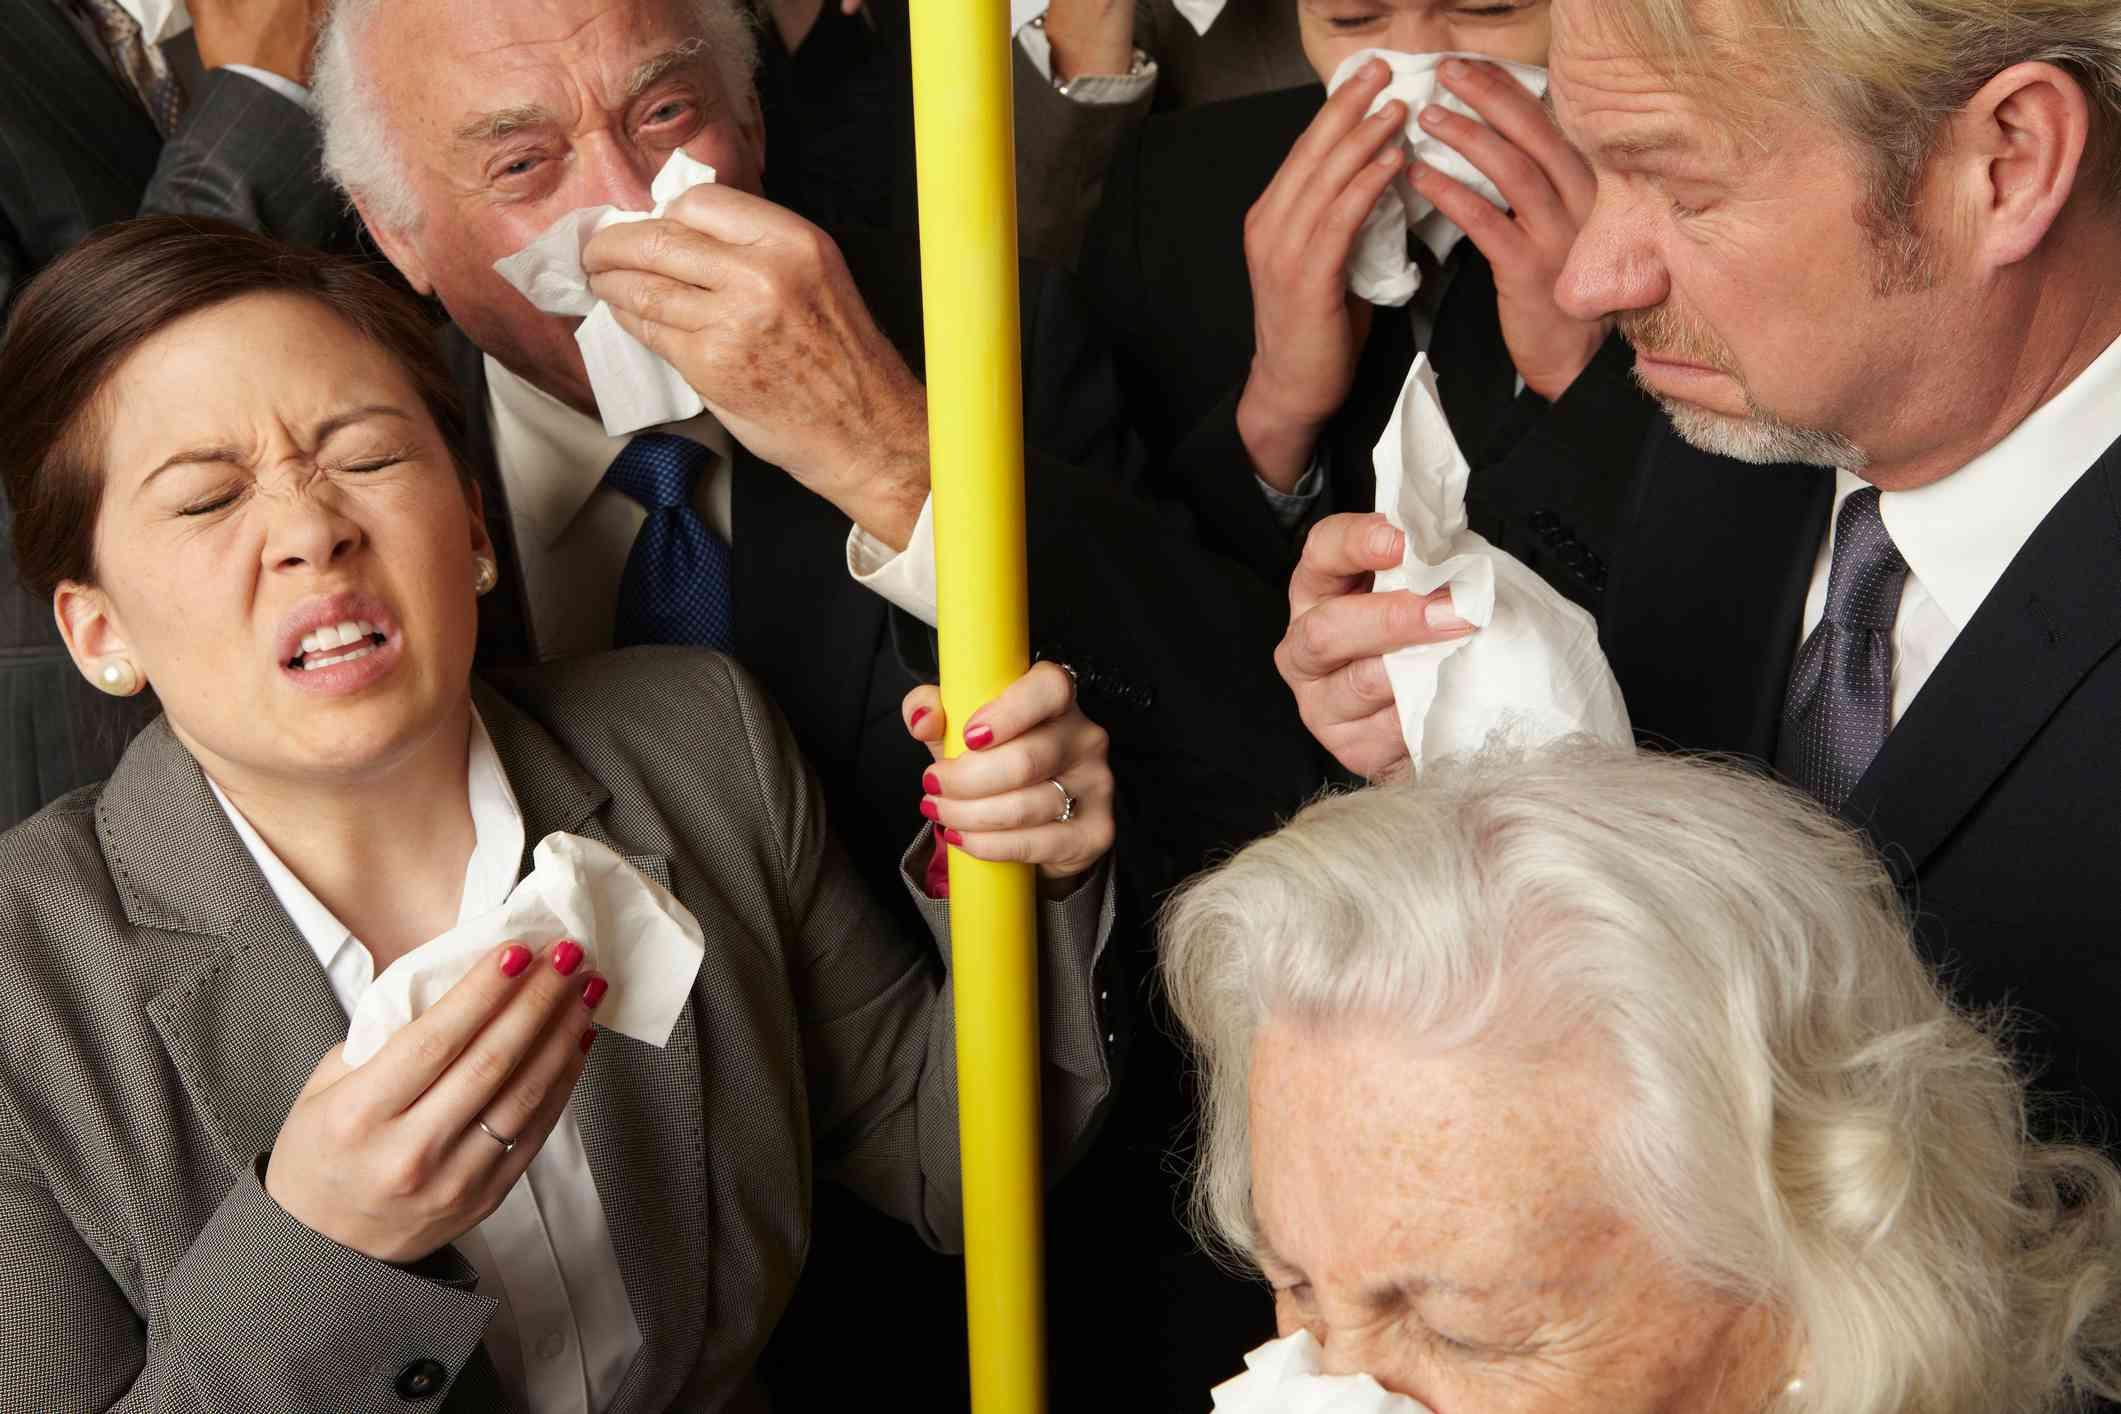 Businesspeople sneezing on subway train